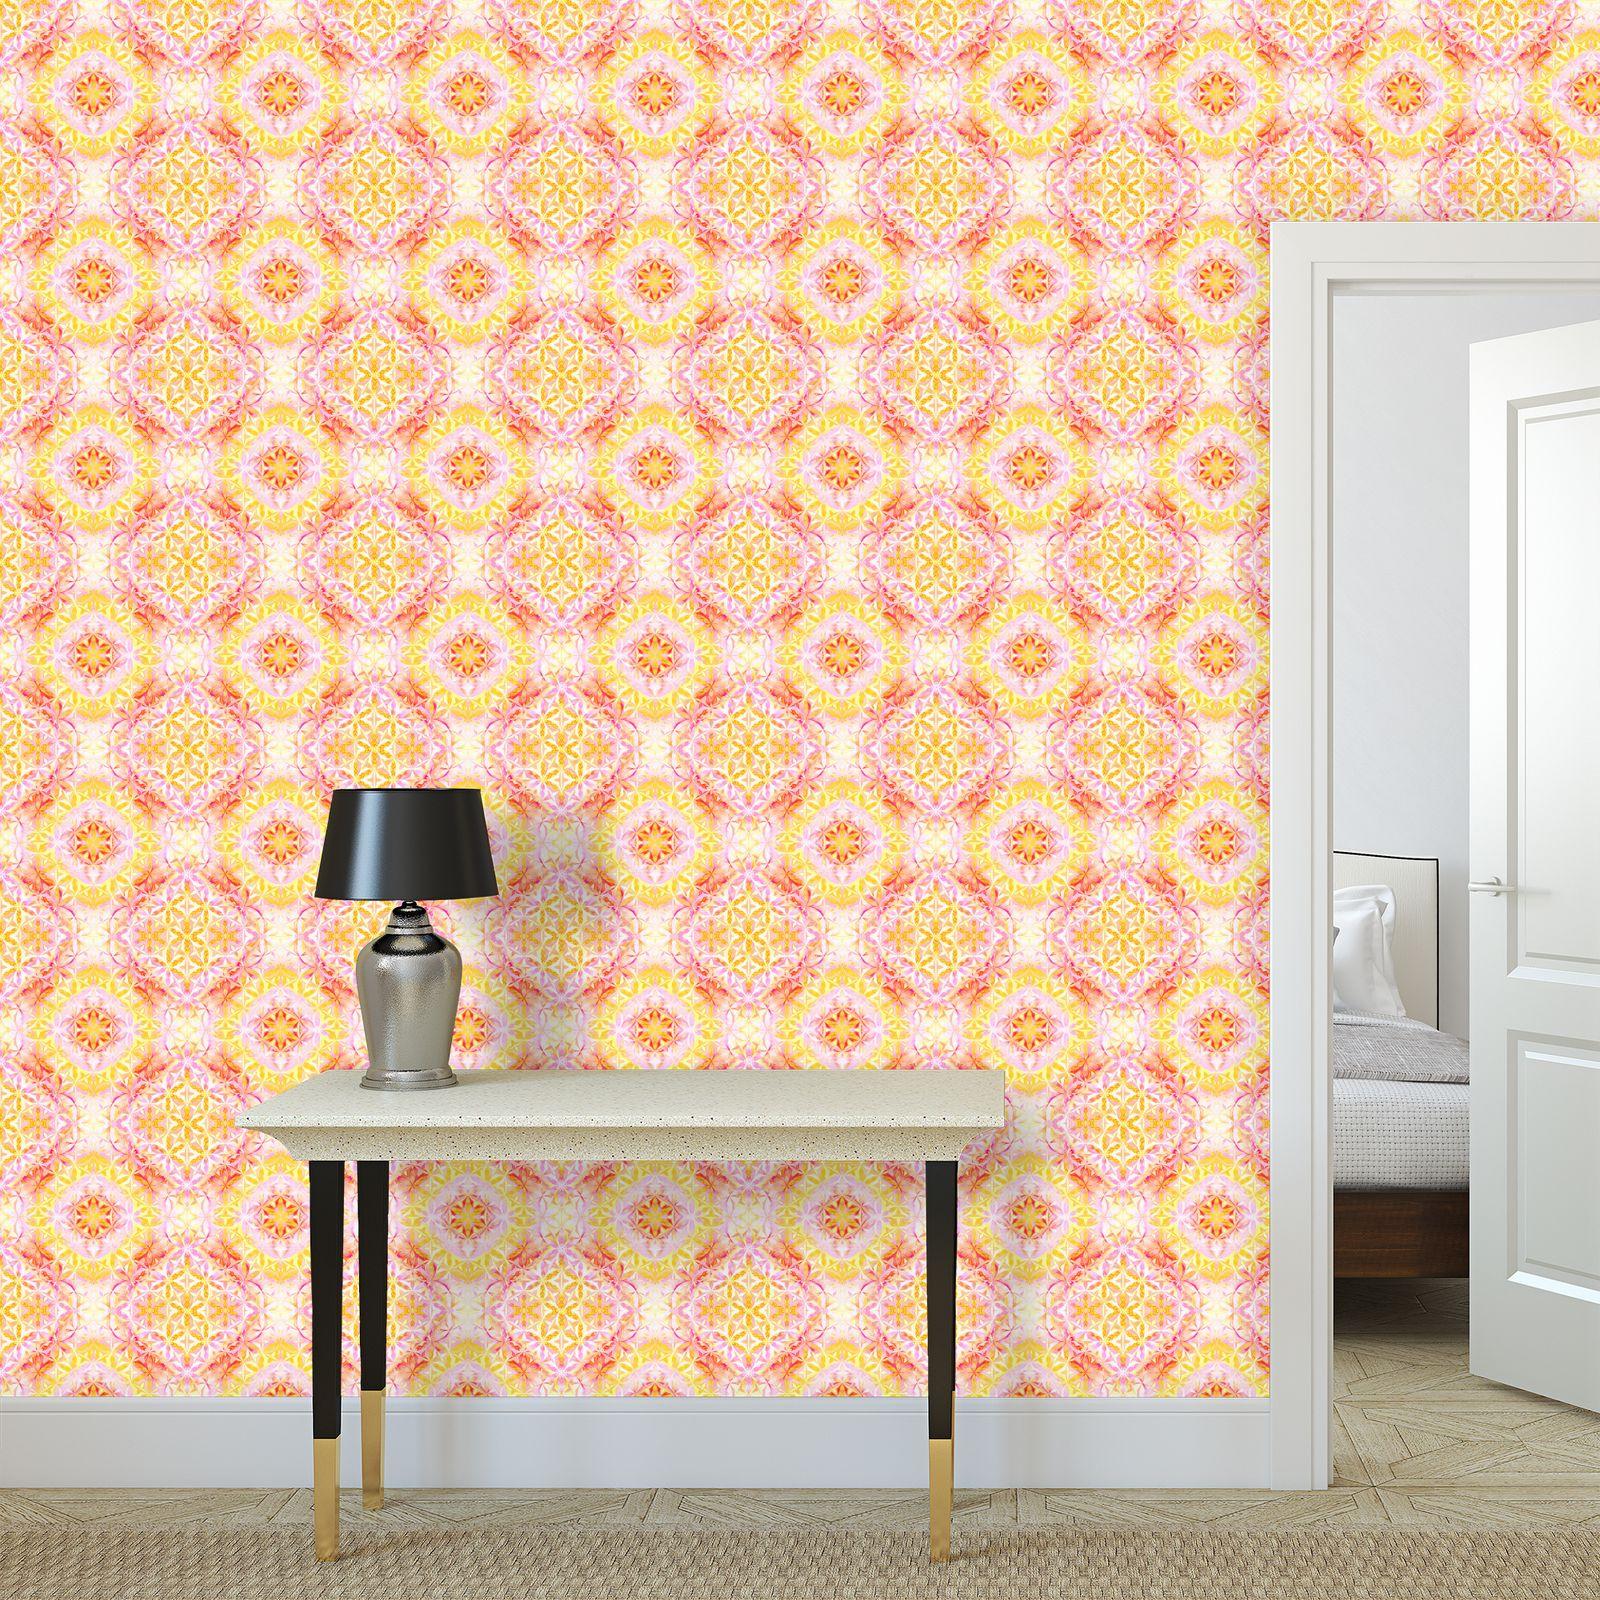 Wallpaper Rolls Painting 50